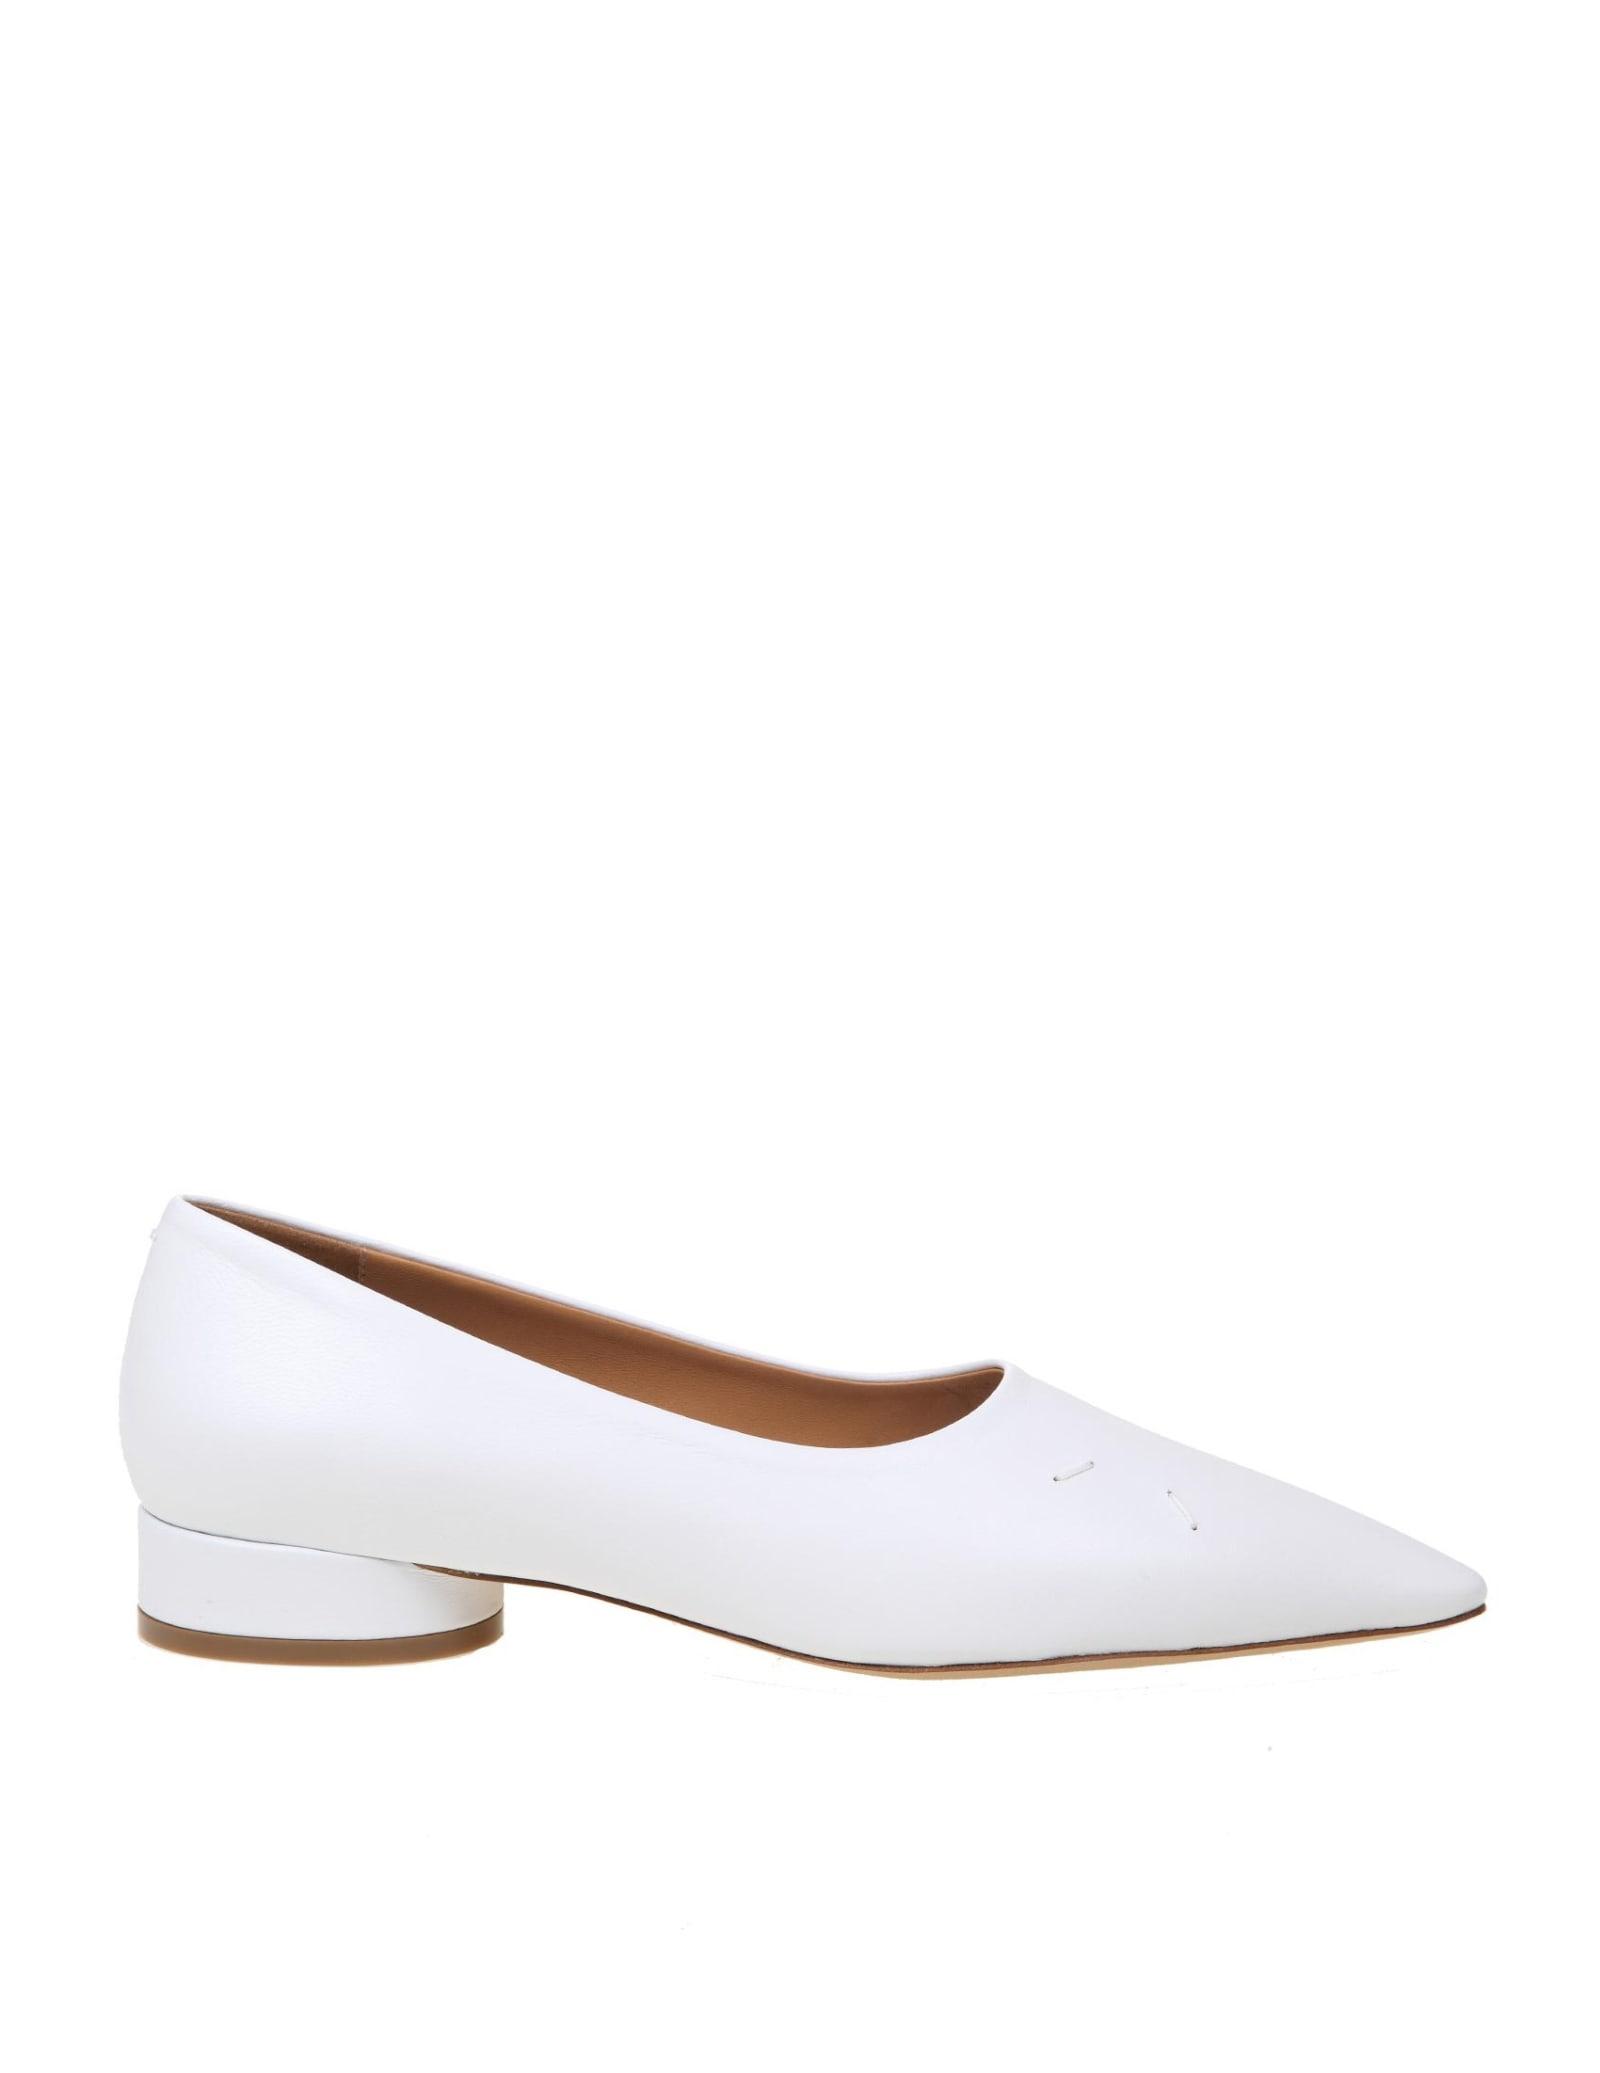 Buy Maison Margiela Kiki Ballerina In White Leather online, shop Maison Margiela shoes with free shipping